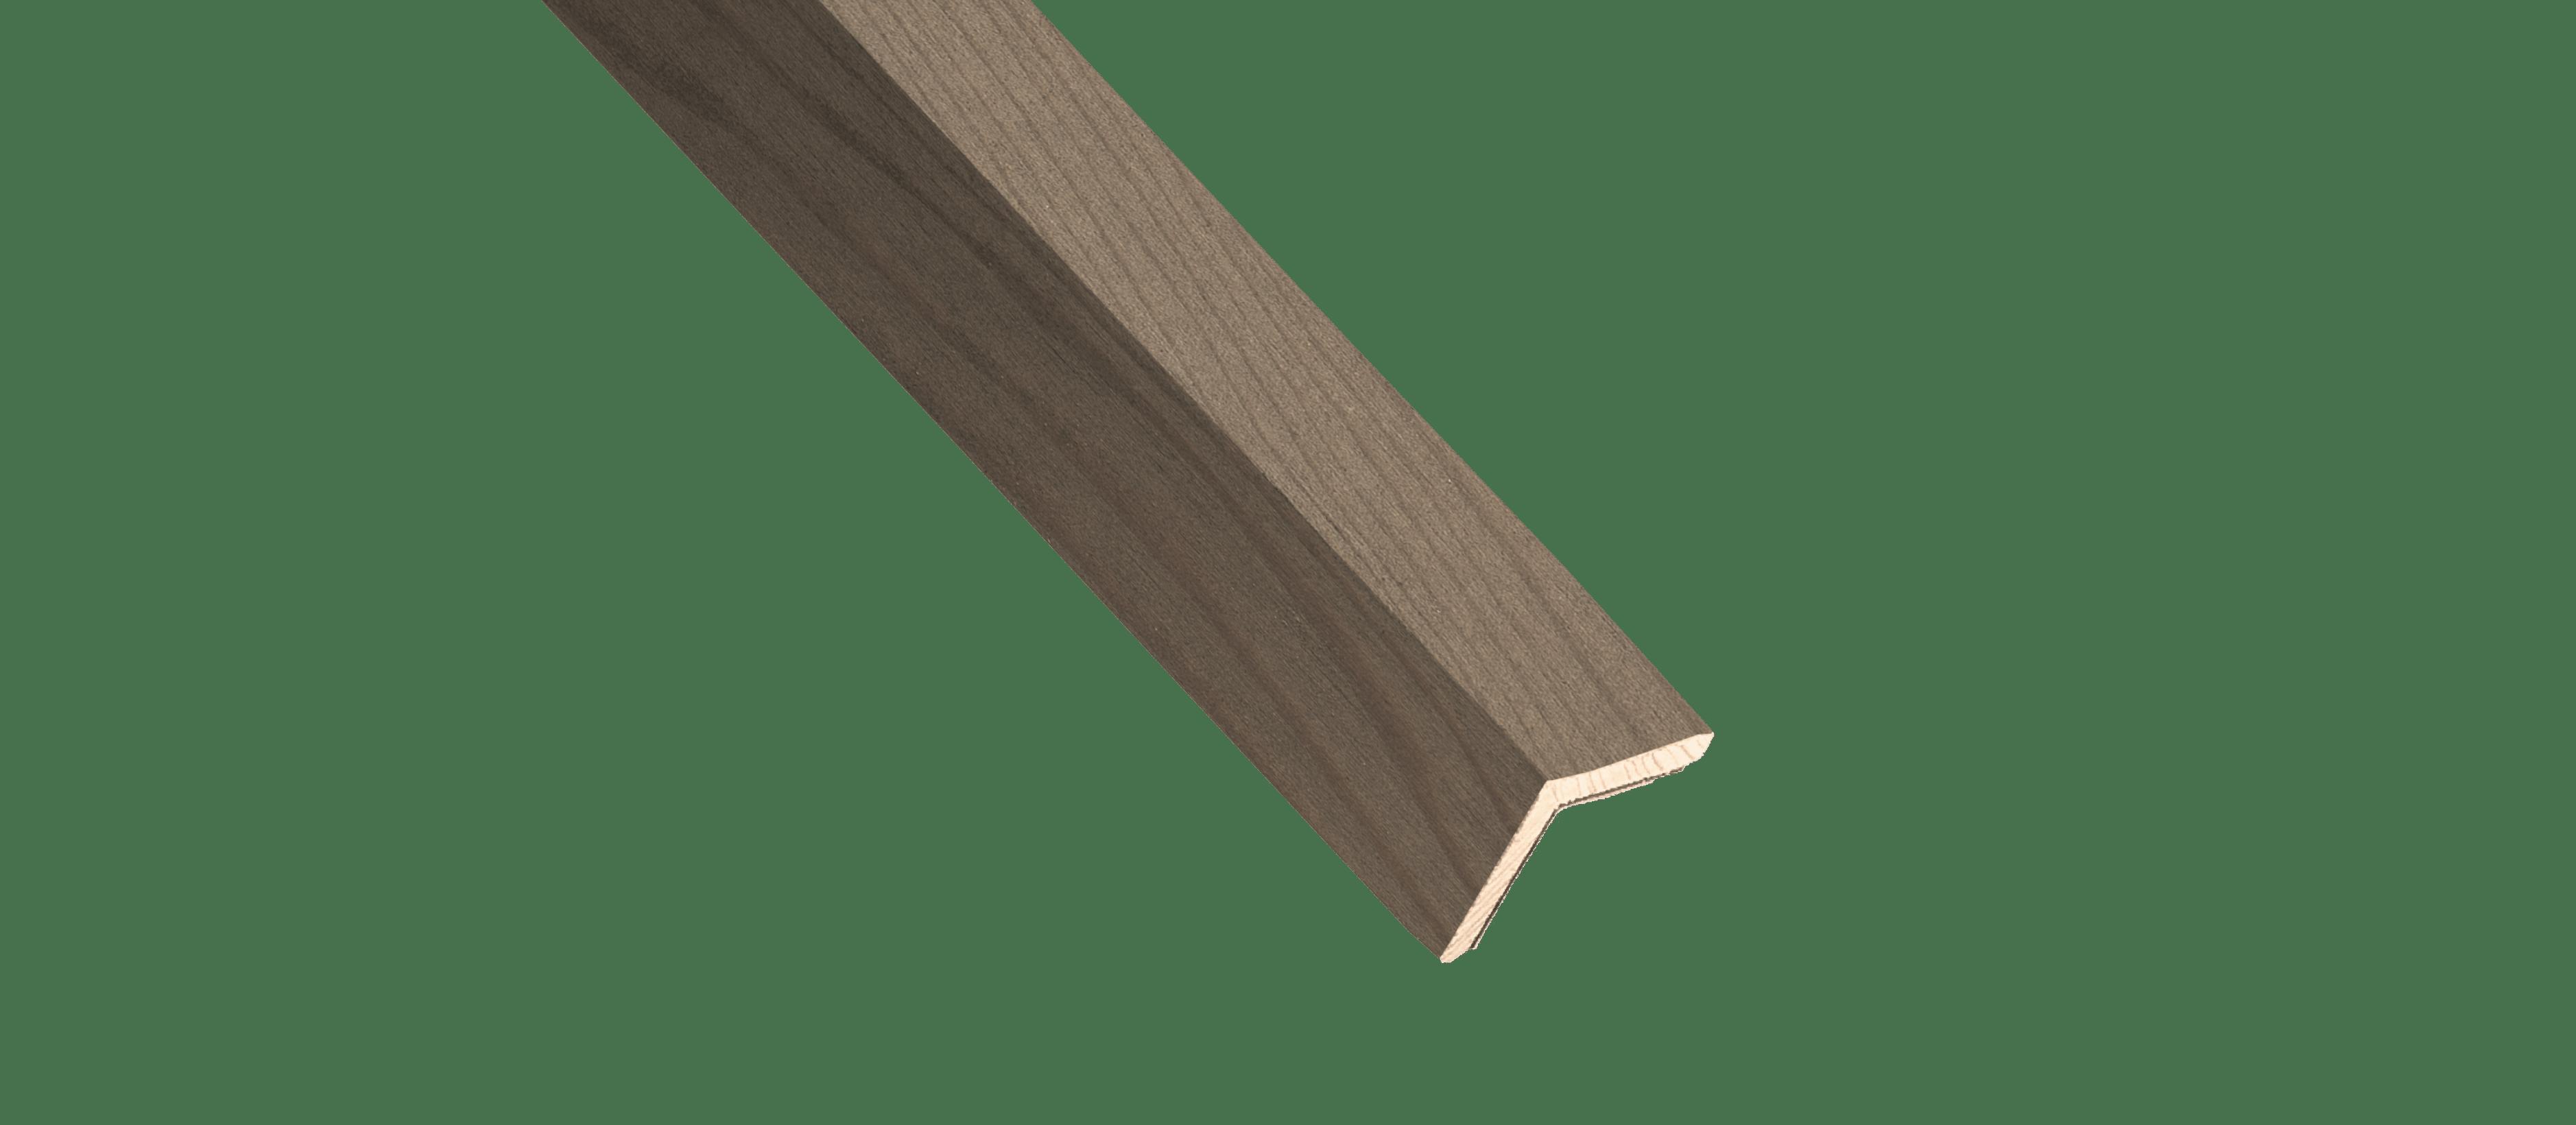 Reclaimed Rustic Slate Wood Corner Trim Sample